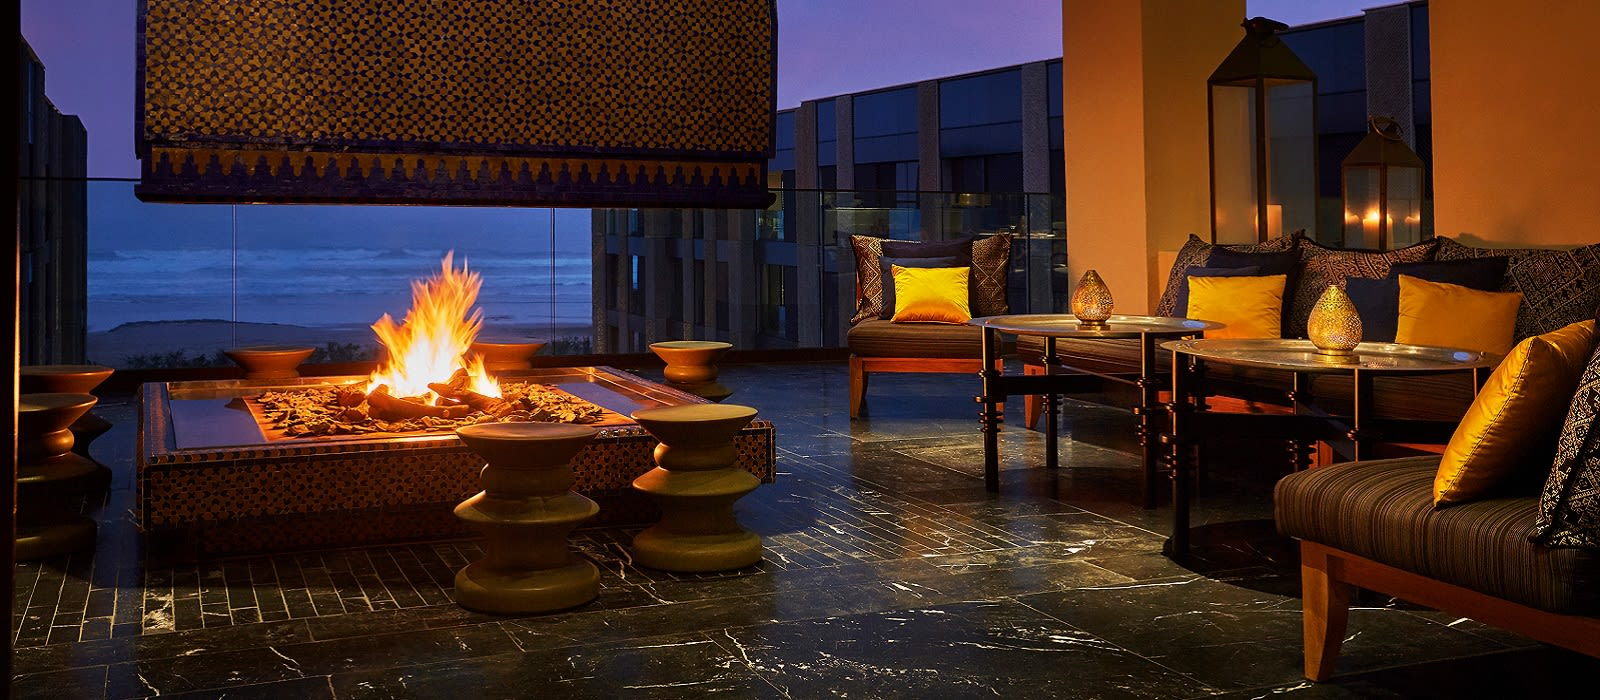 Hotel Four Seasons  Casablanca Marokko